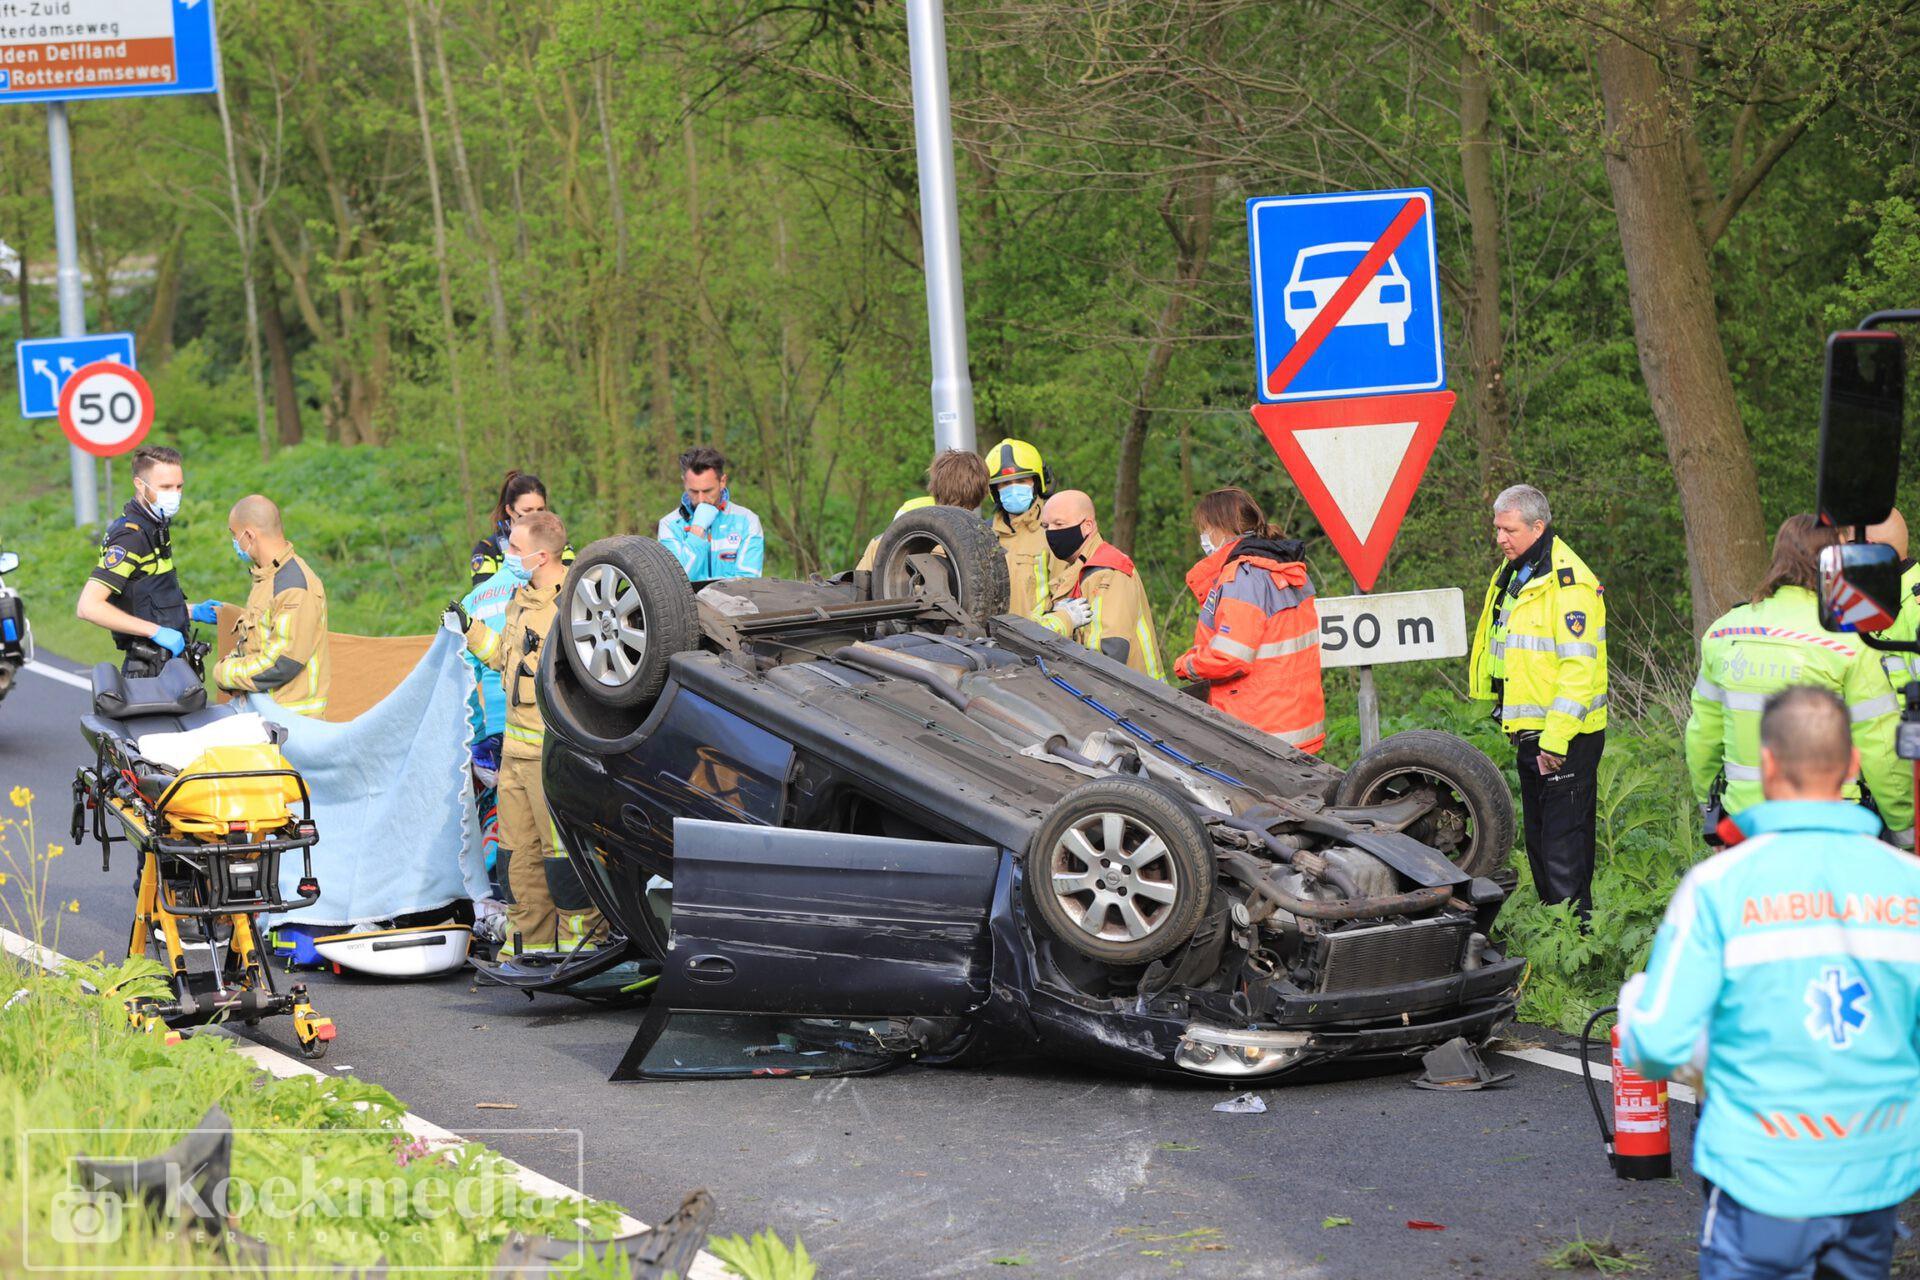 Fataal ongeval bij afrit Kruithuisweg Delft